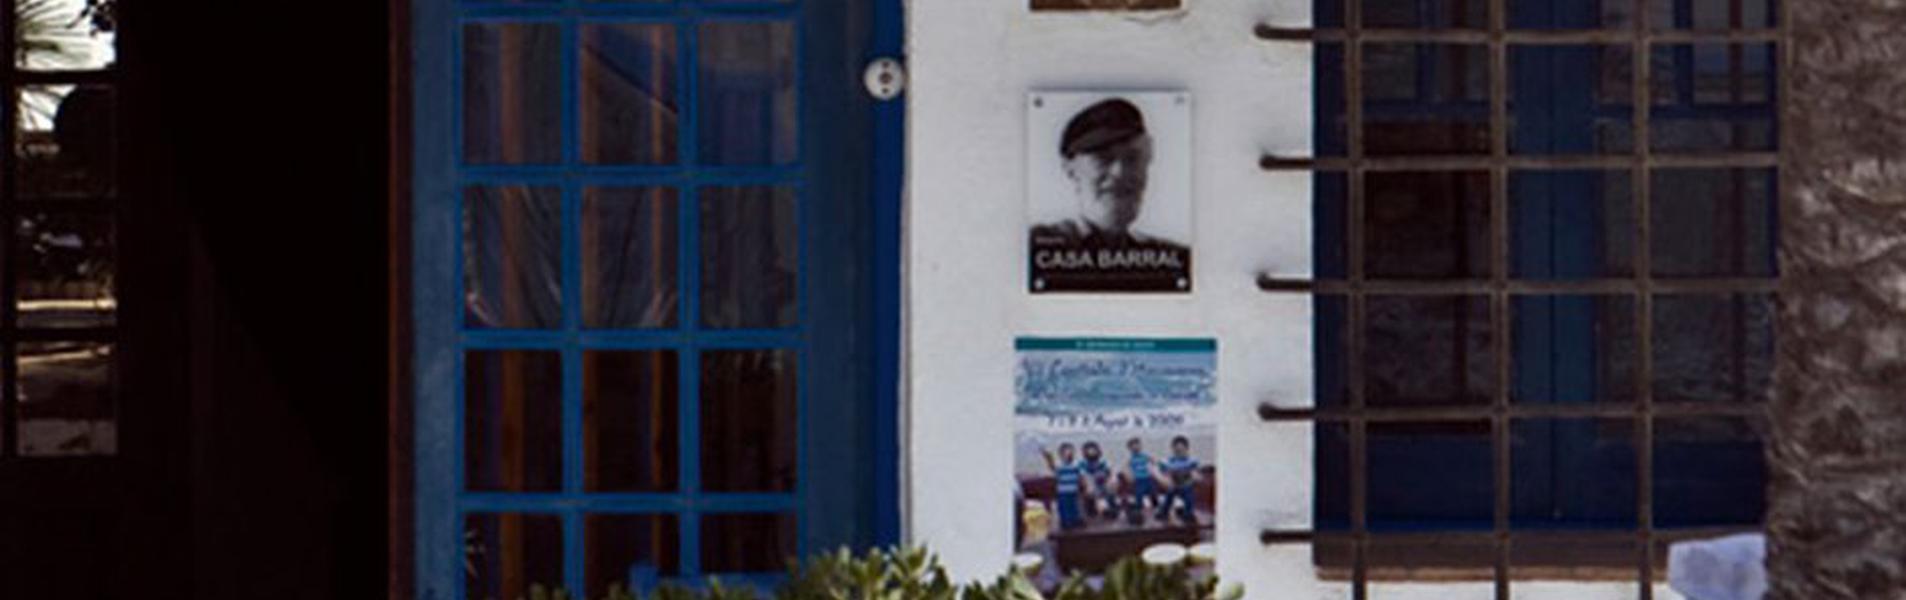 Museo Casa Barral